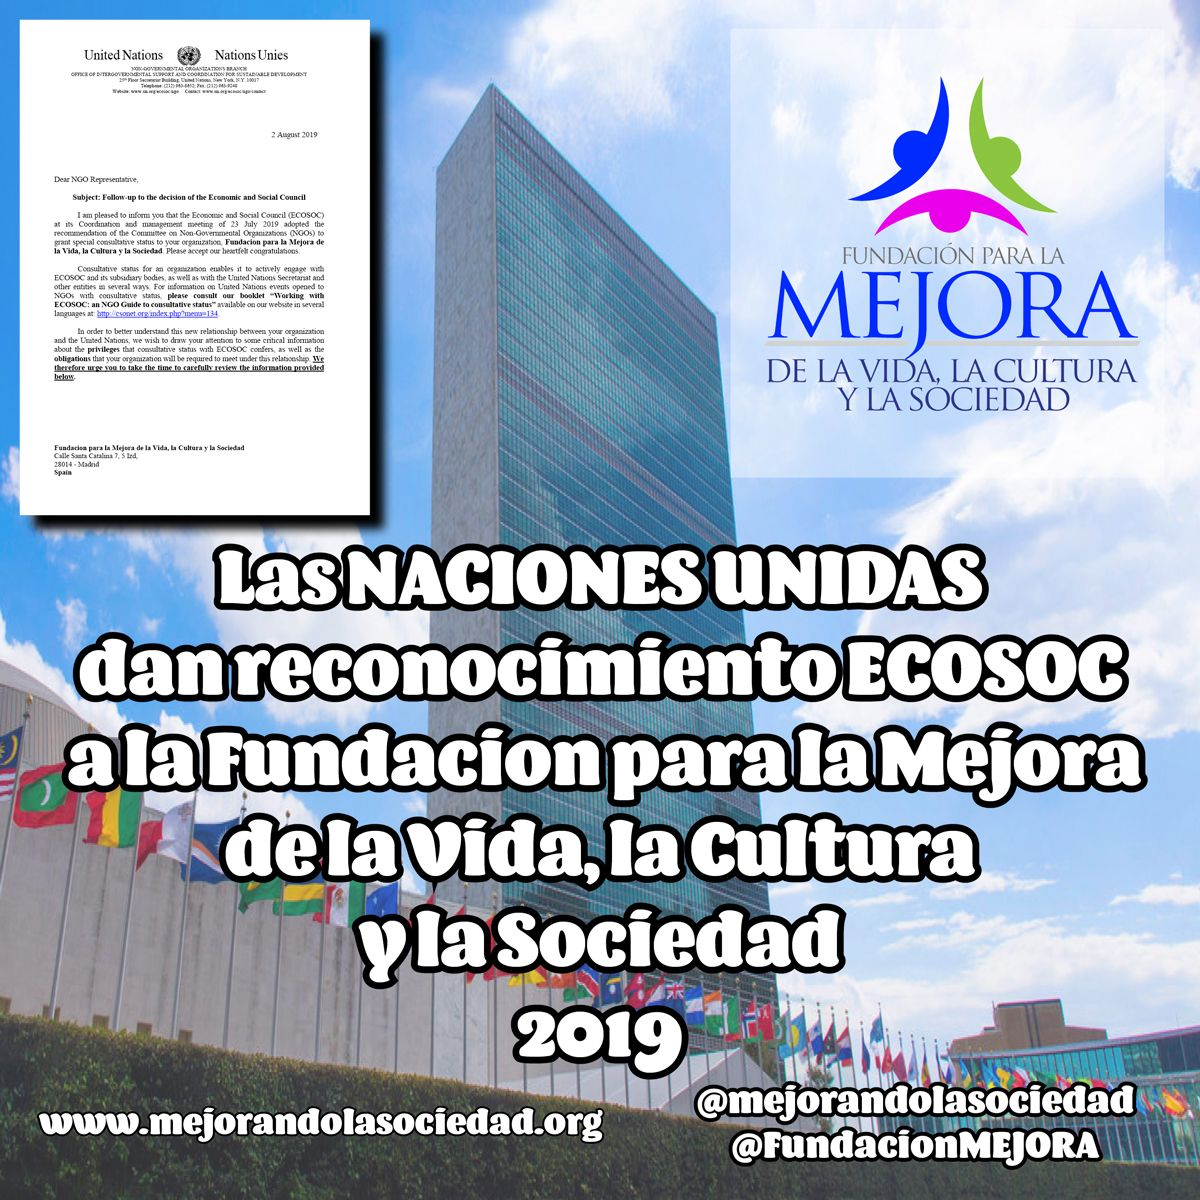 www.mejorandolasociedad.org